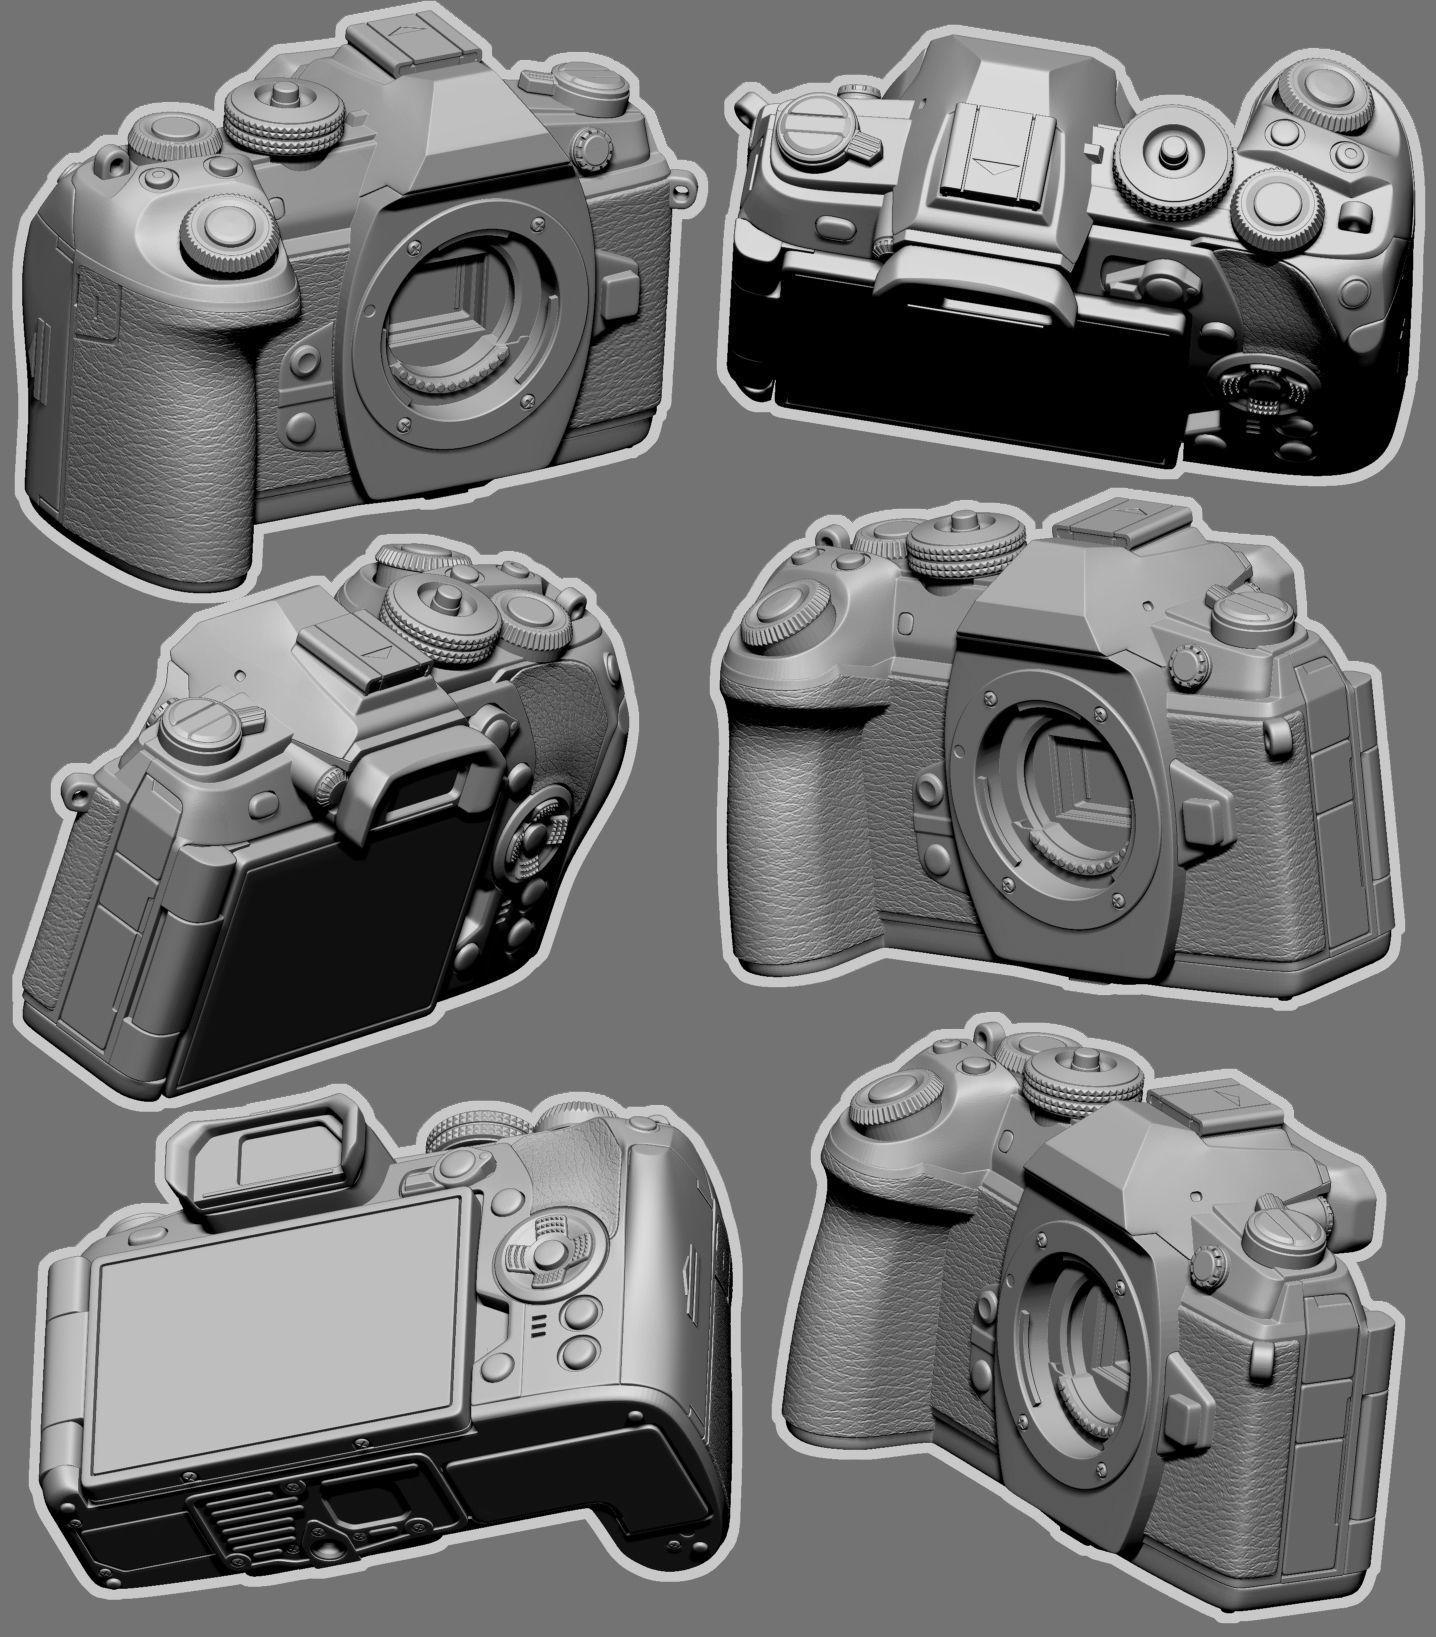 Camera Model-Olympus E-M1 Mark II